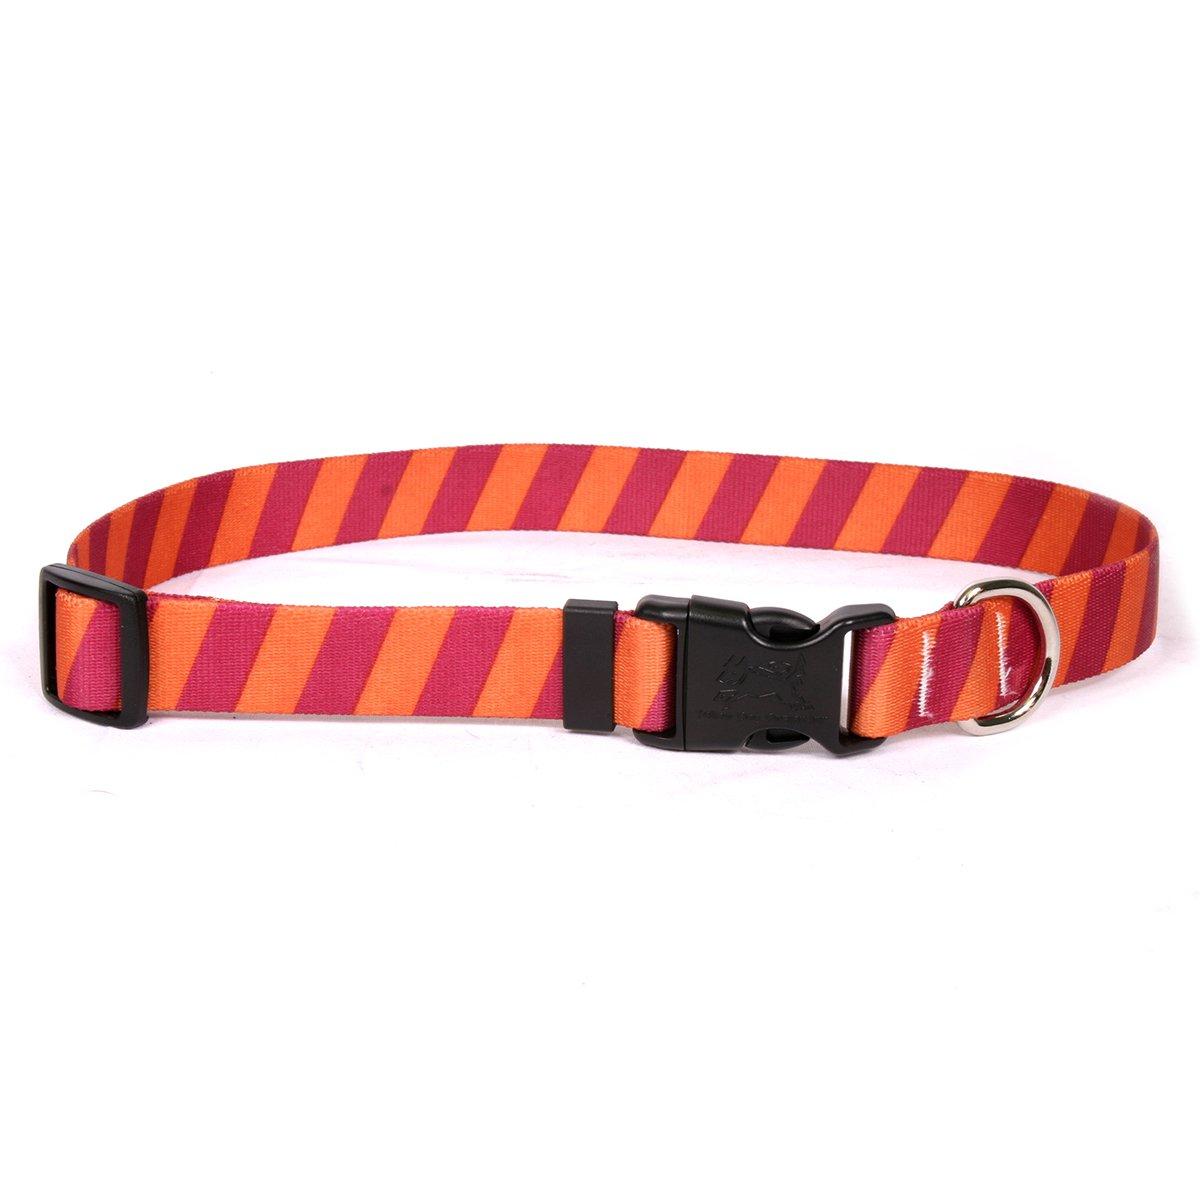 Yellow Dog Design Team Spirit Maroon and Orange Dog Collar with ID Tag System-Medium-3/4 Neck 14 to 20''/4''